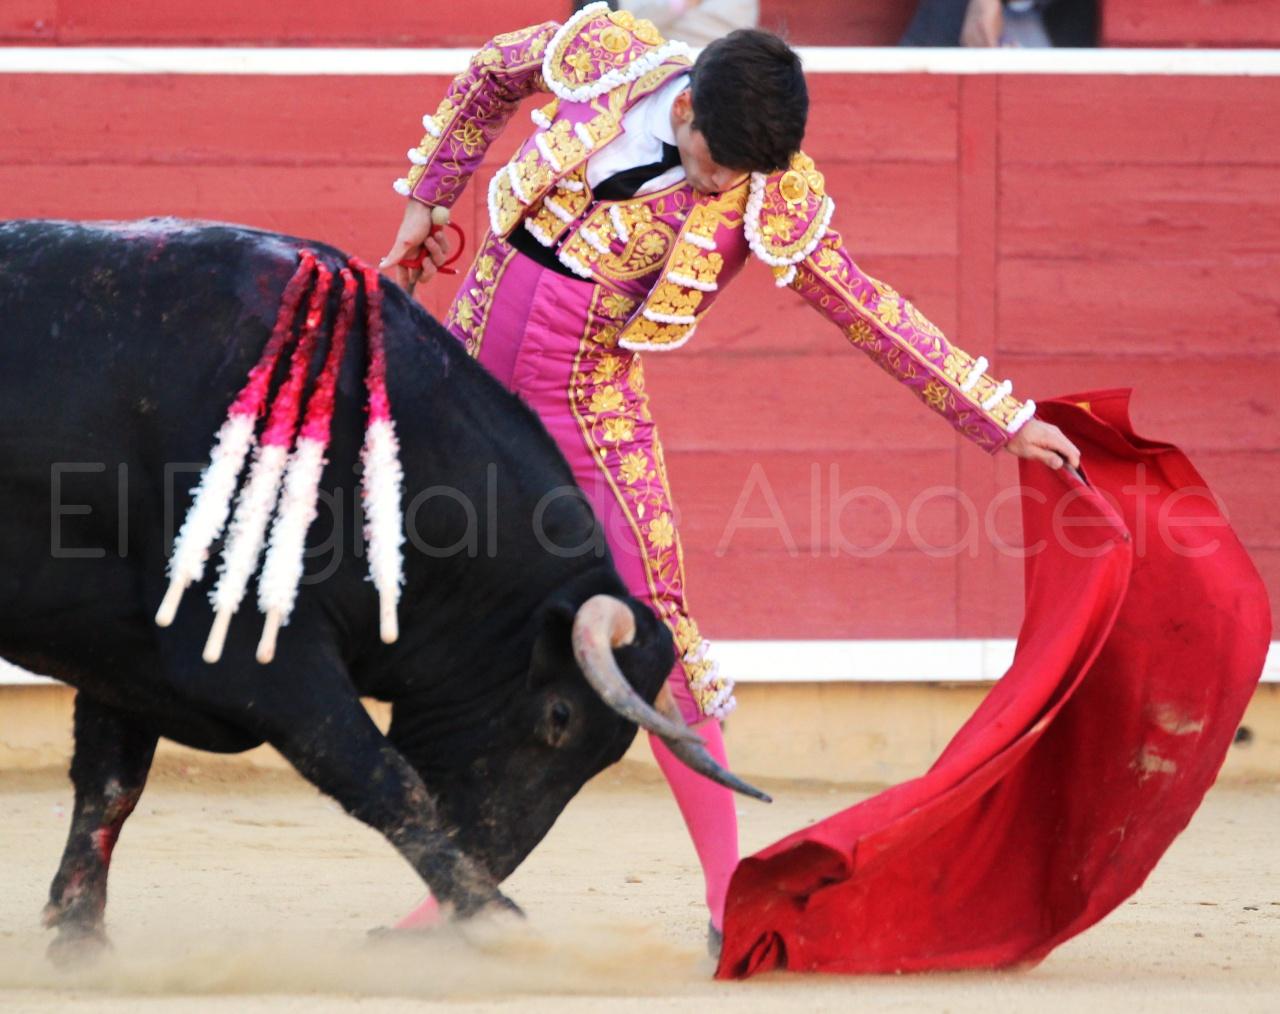 El Juli Lopez Simon y Garrido Feria Albacete 2015 toros  72